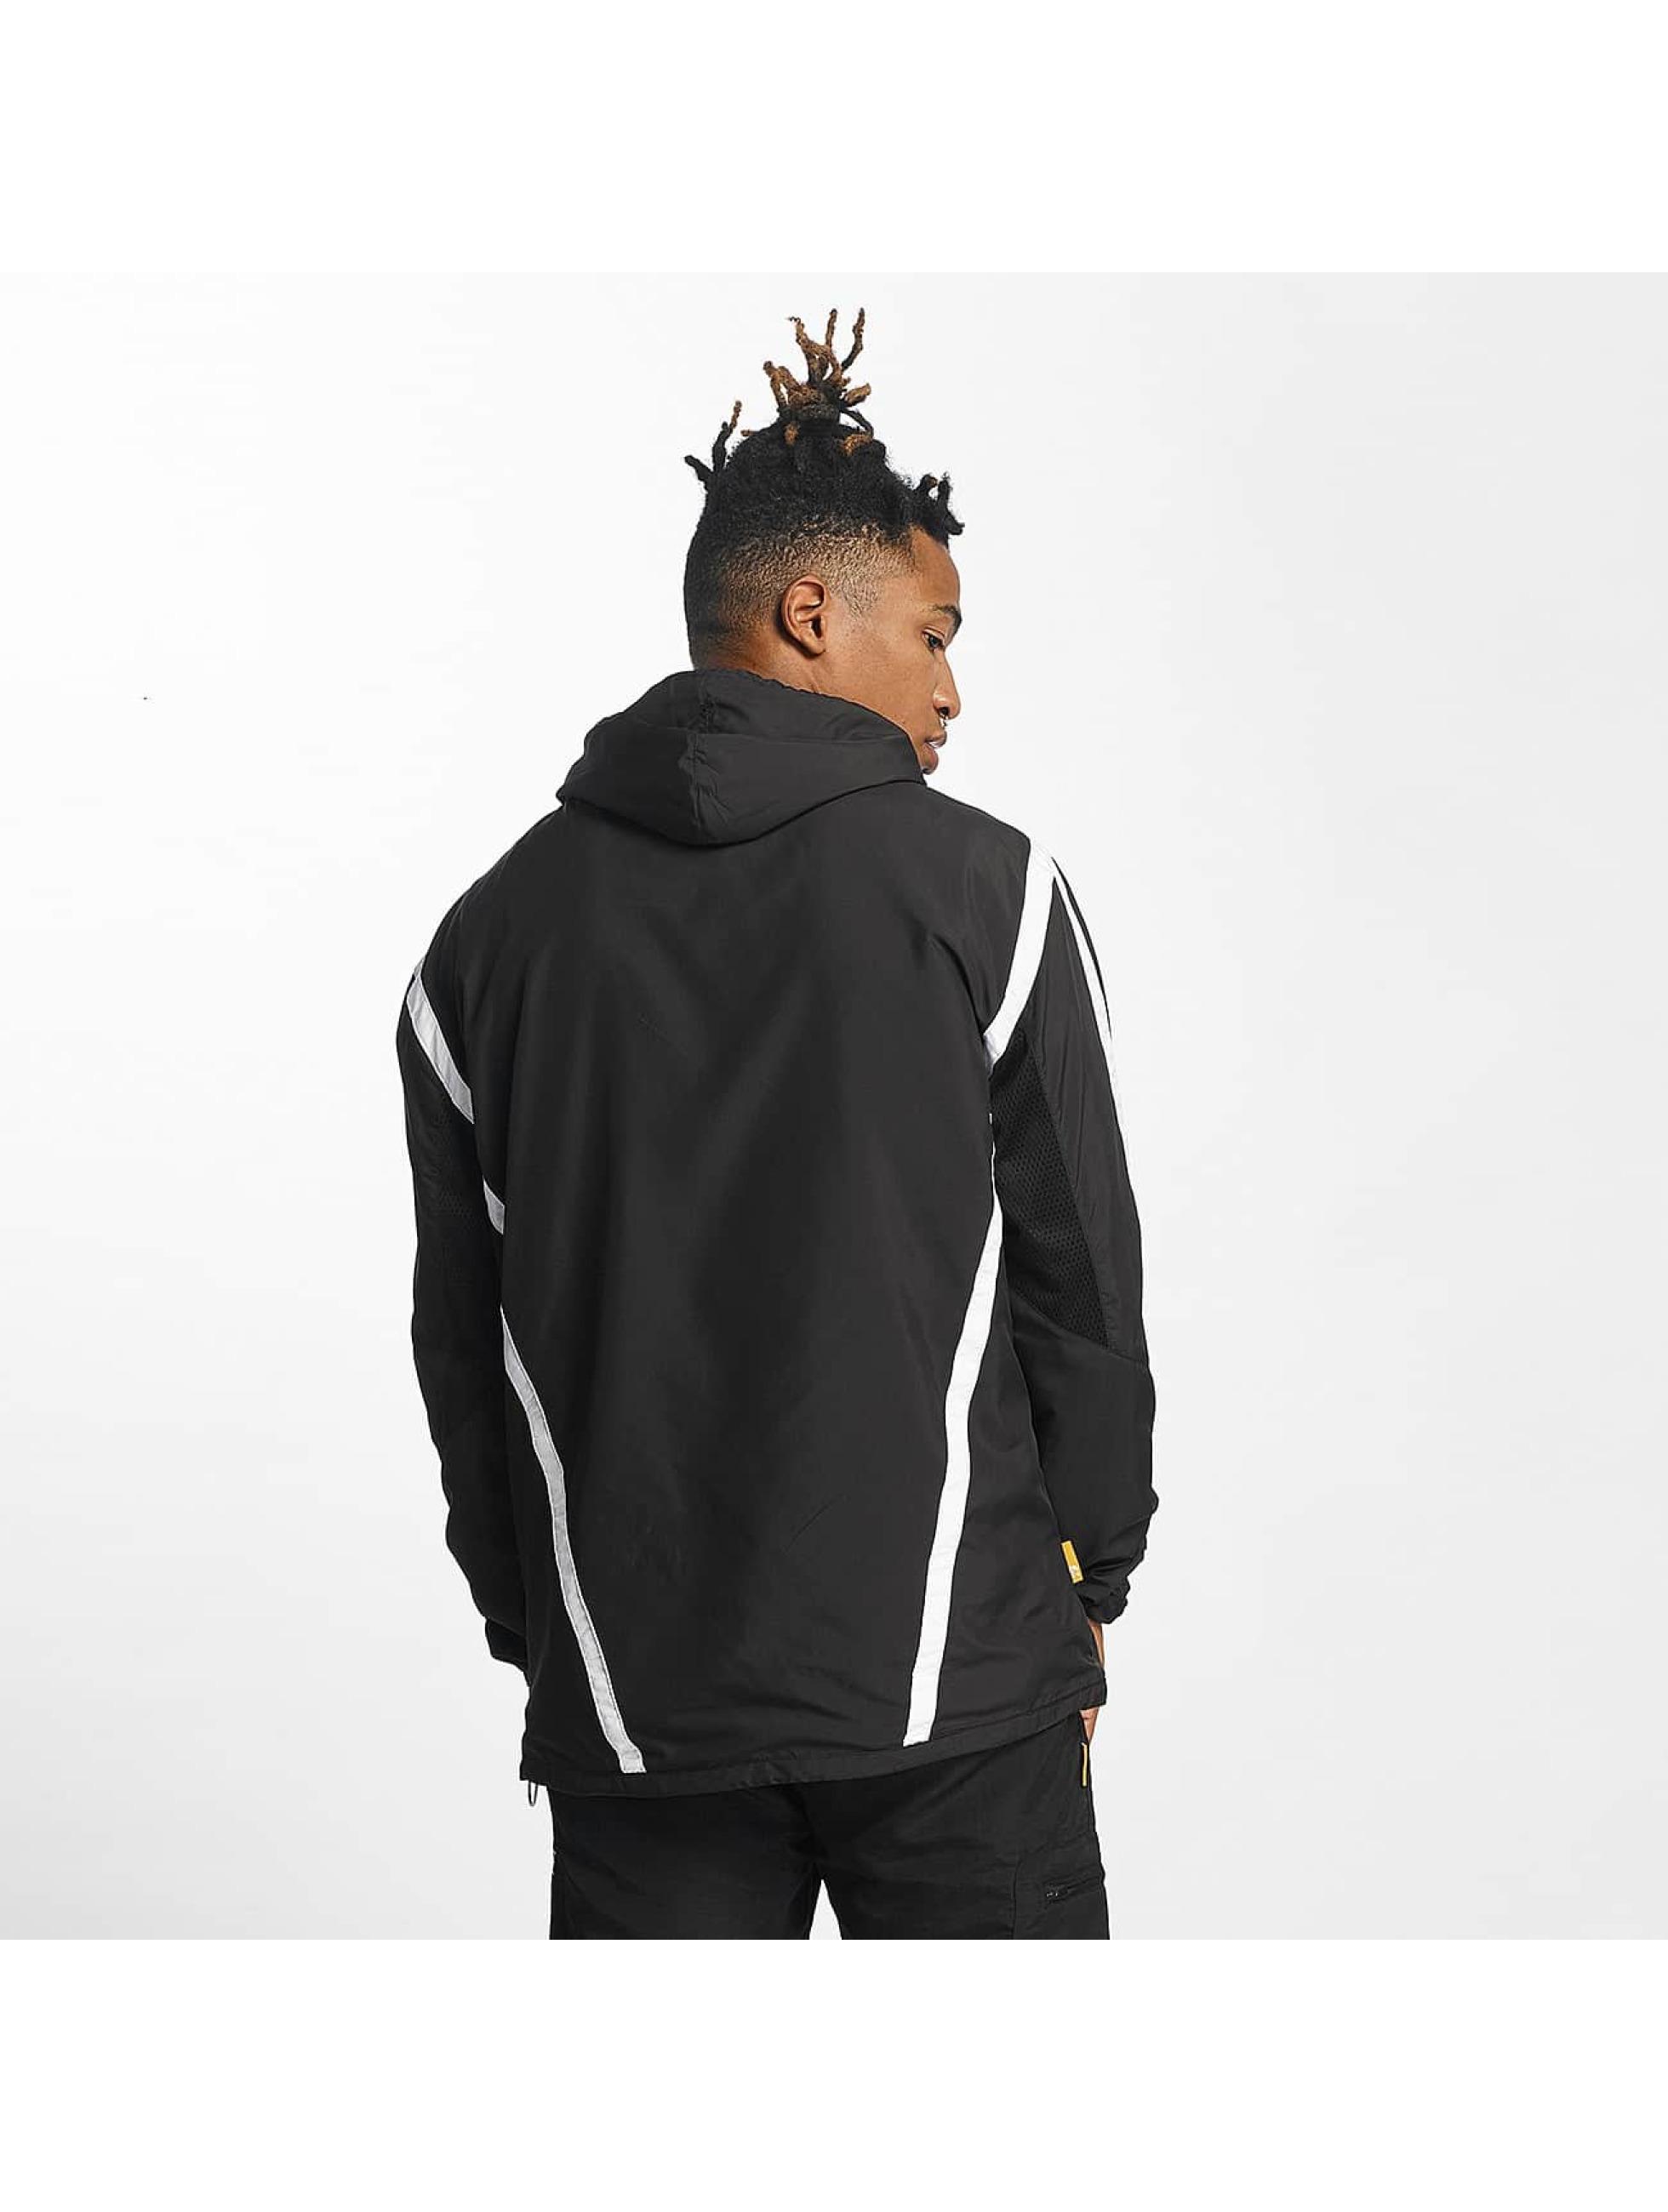 CHABOS IIVII Transitional Jackets Half Zip Hooded svart